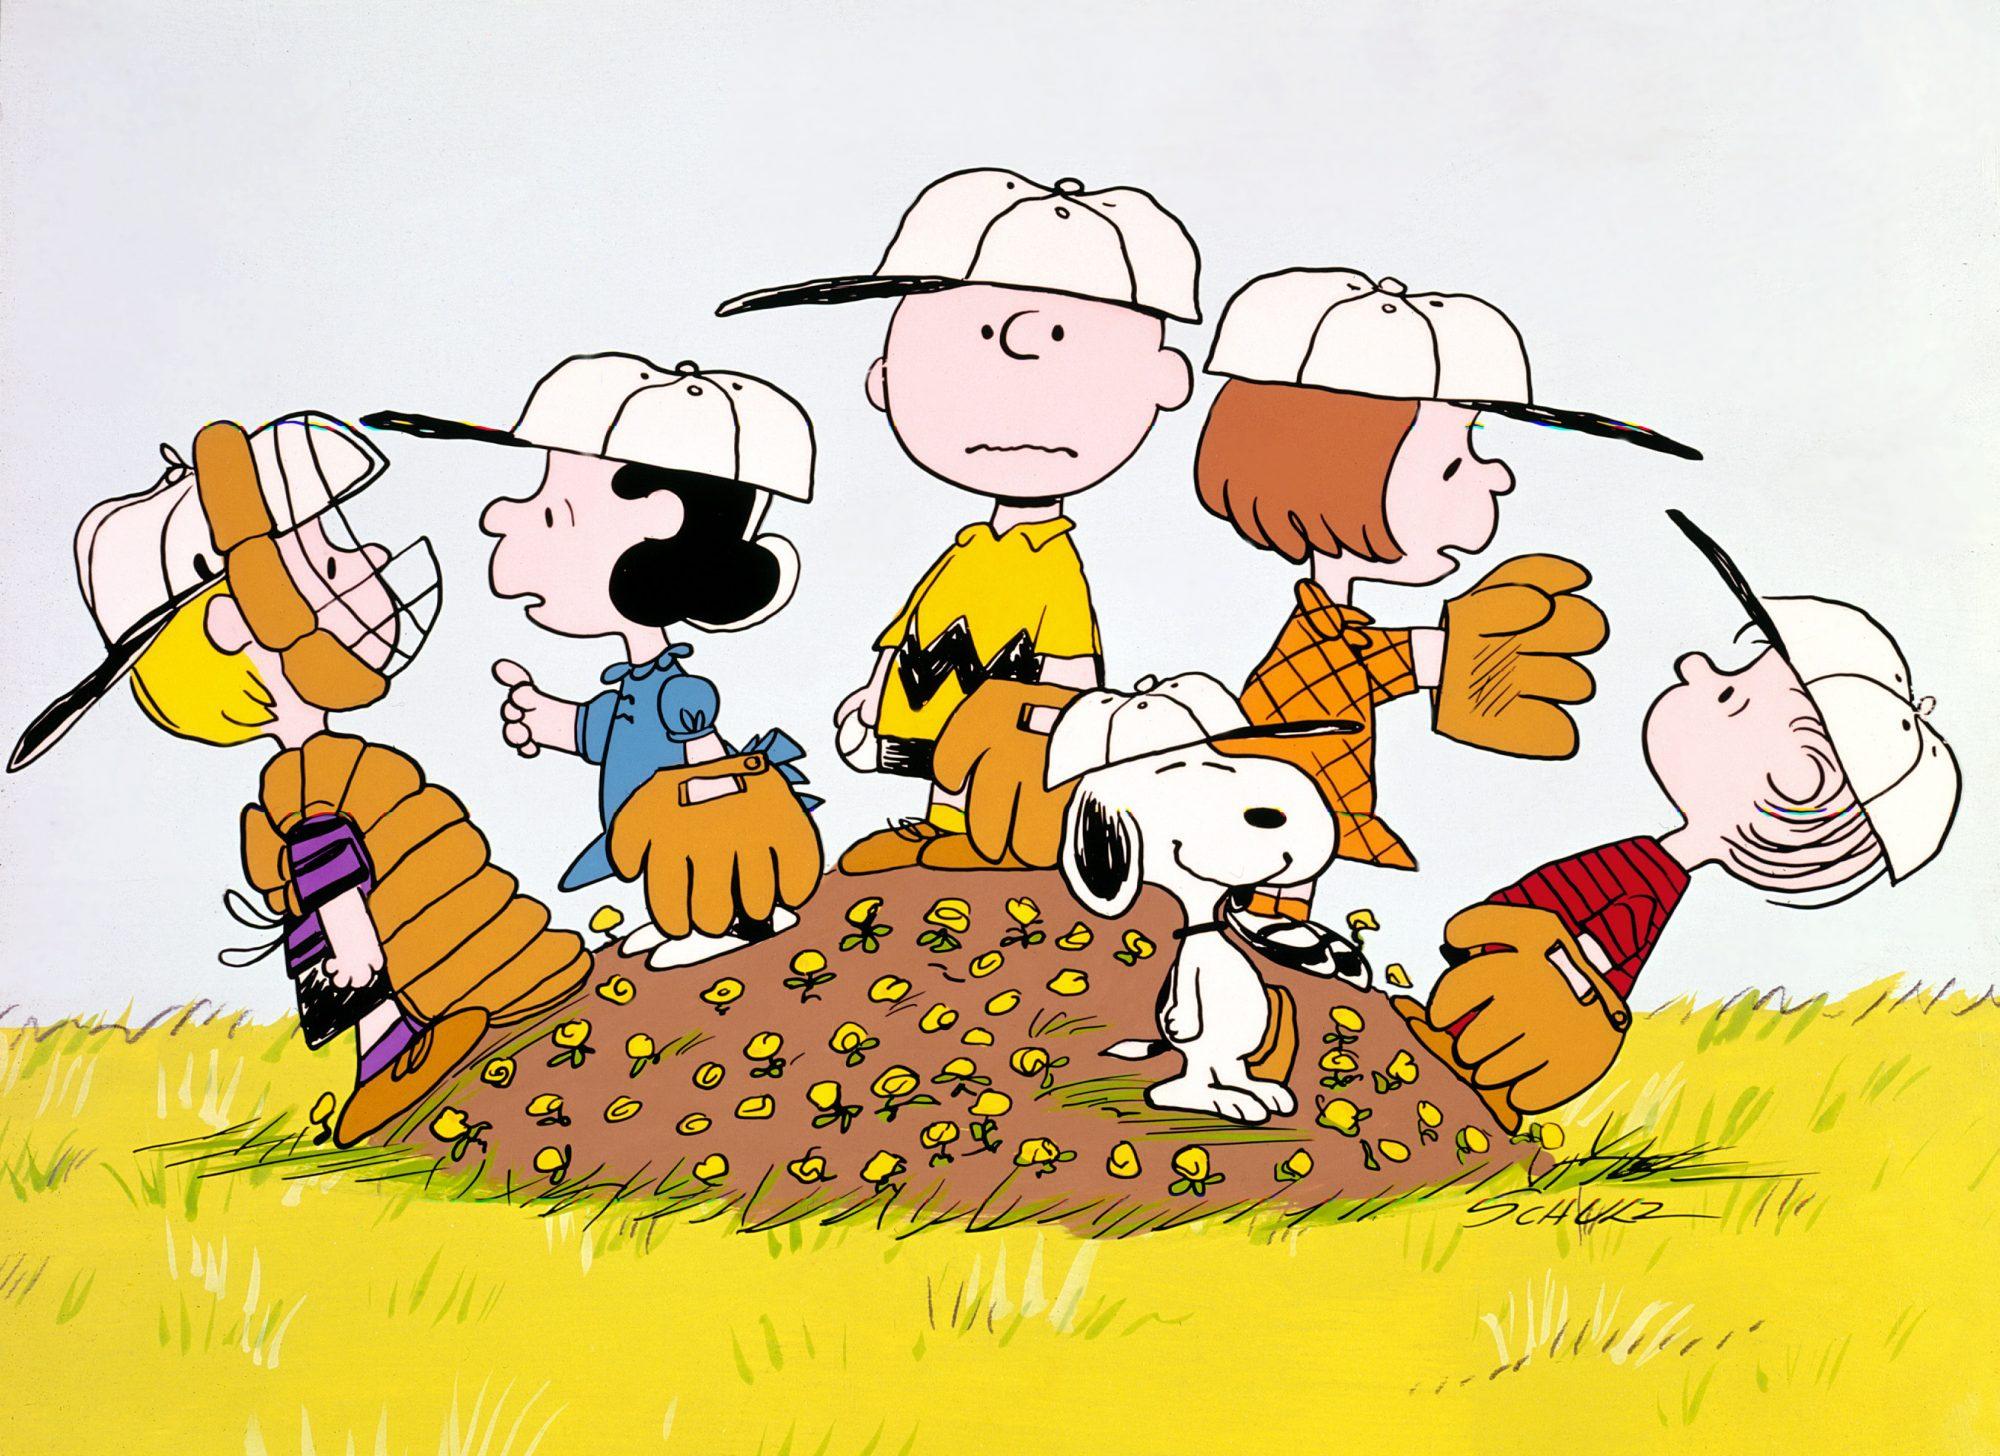 BOY NAMED CHARLIE BROWN, Schroeder, Lucy van Pelt, Charlie Brown, Snoopy, Patty, Linus van Pelt, 196